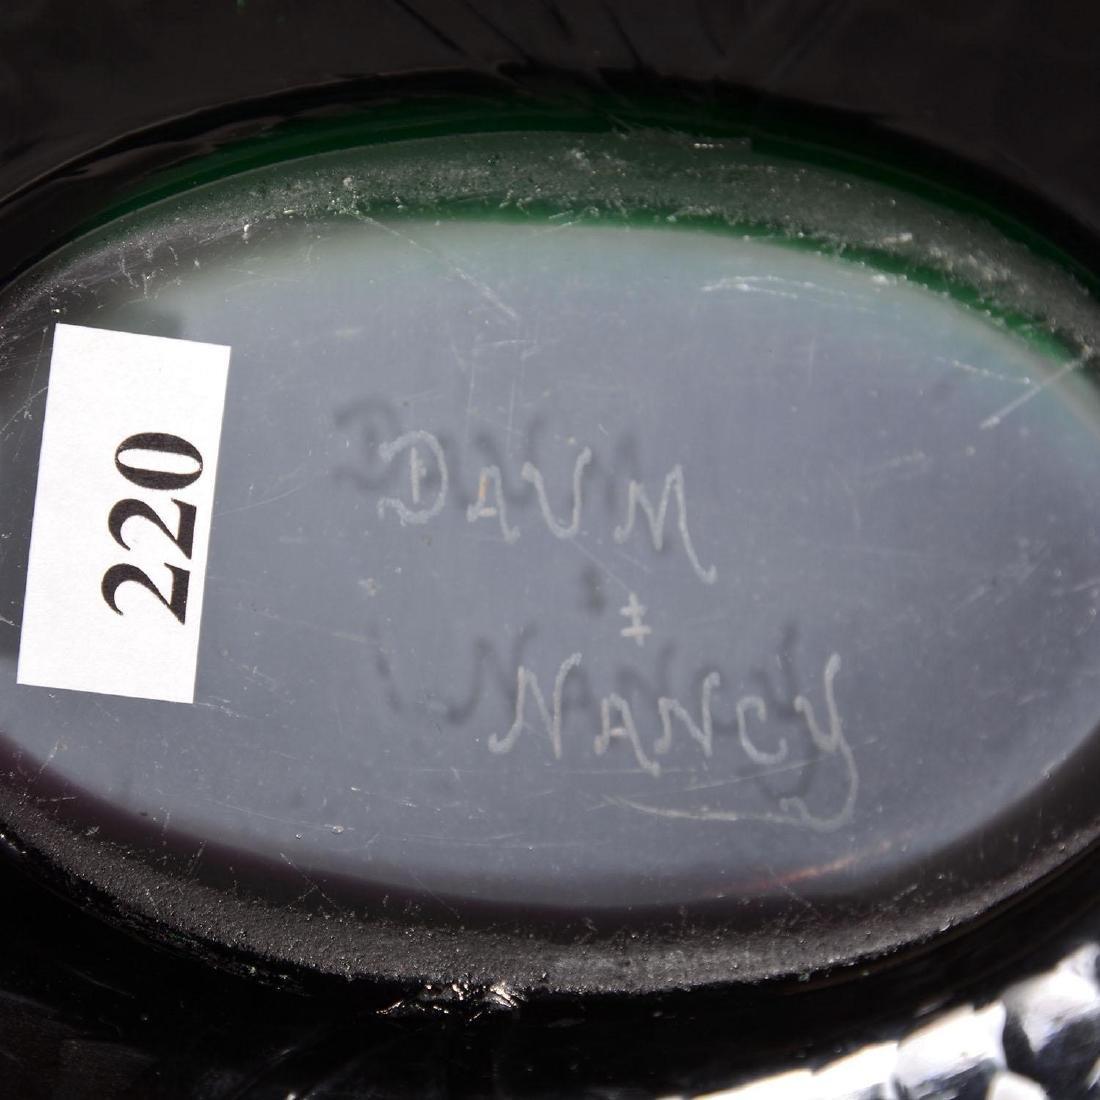 "3.75"" X 11.5"" X 7.75"" Signed Daum Nancy French Cameo Bo - 4"